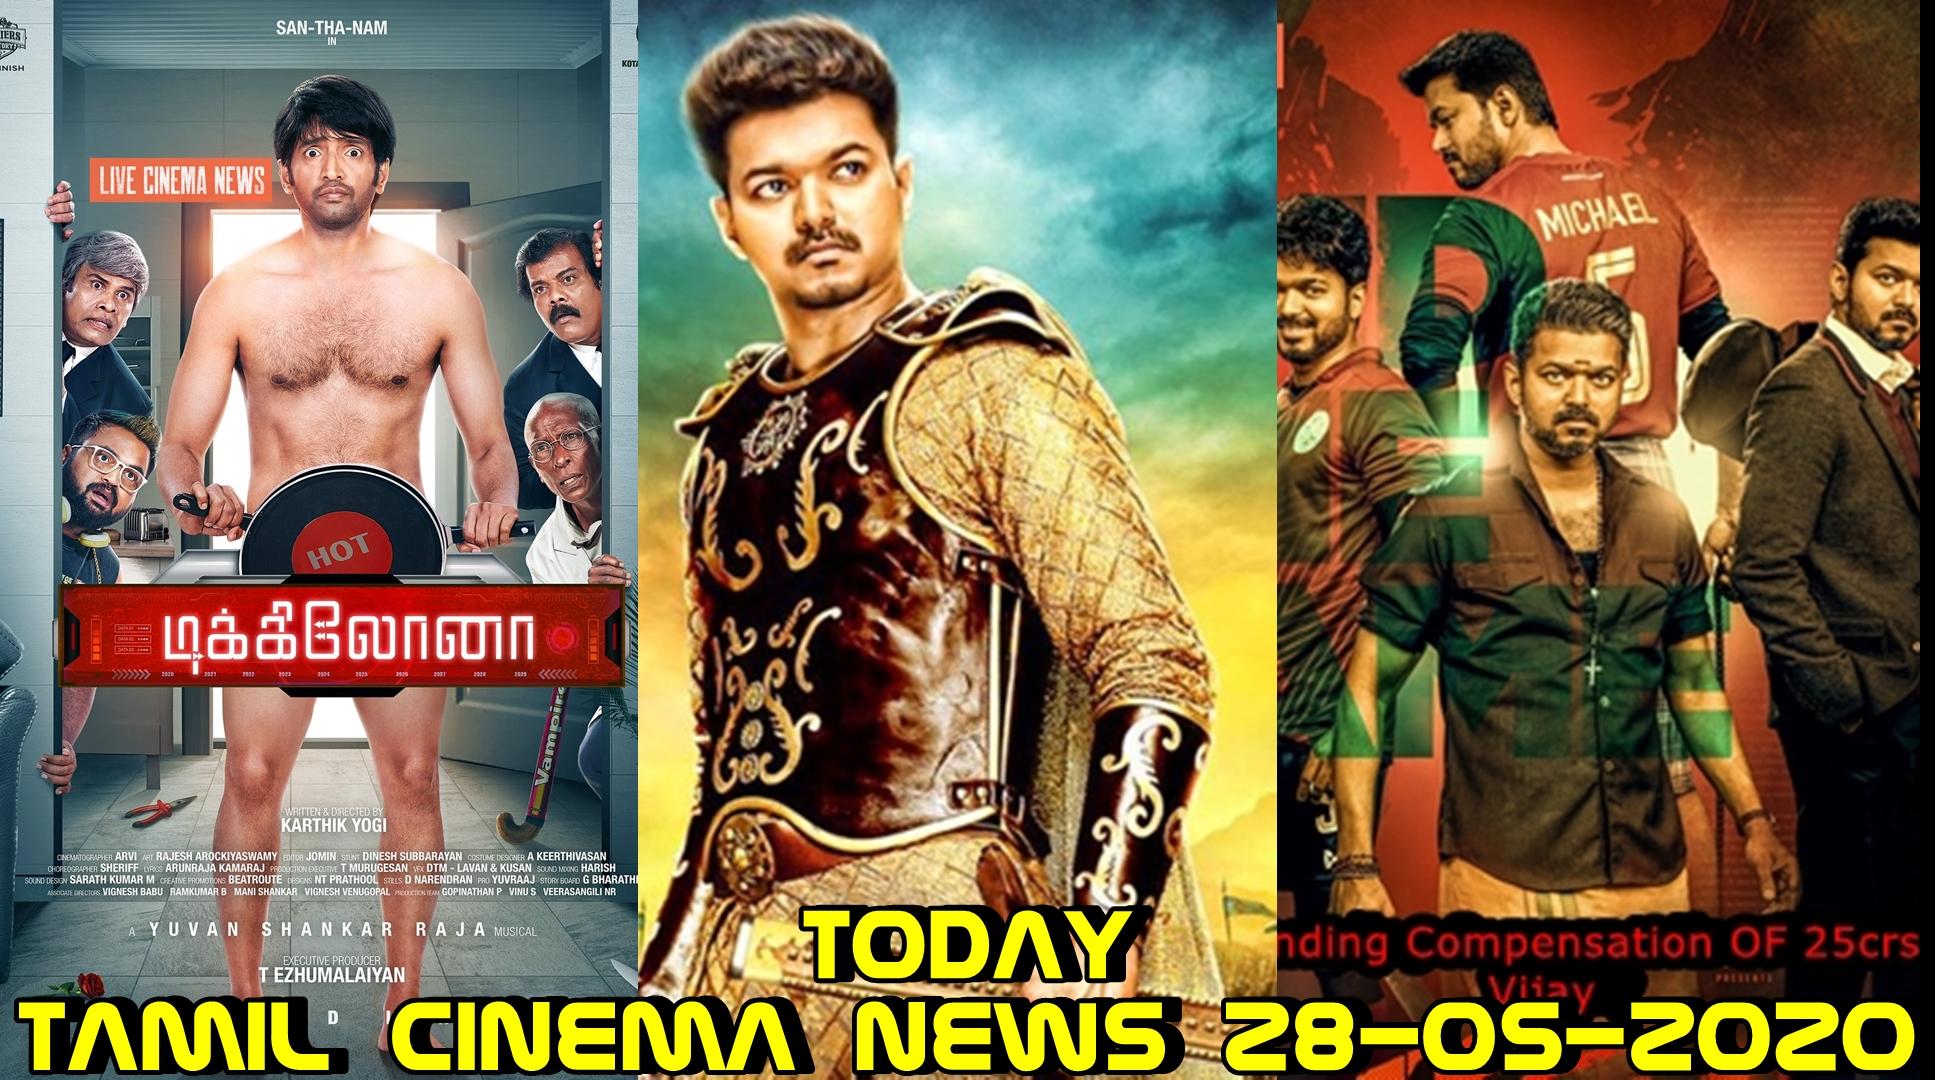 Today Tamil Cinema News 28-05-2020